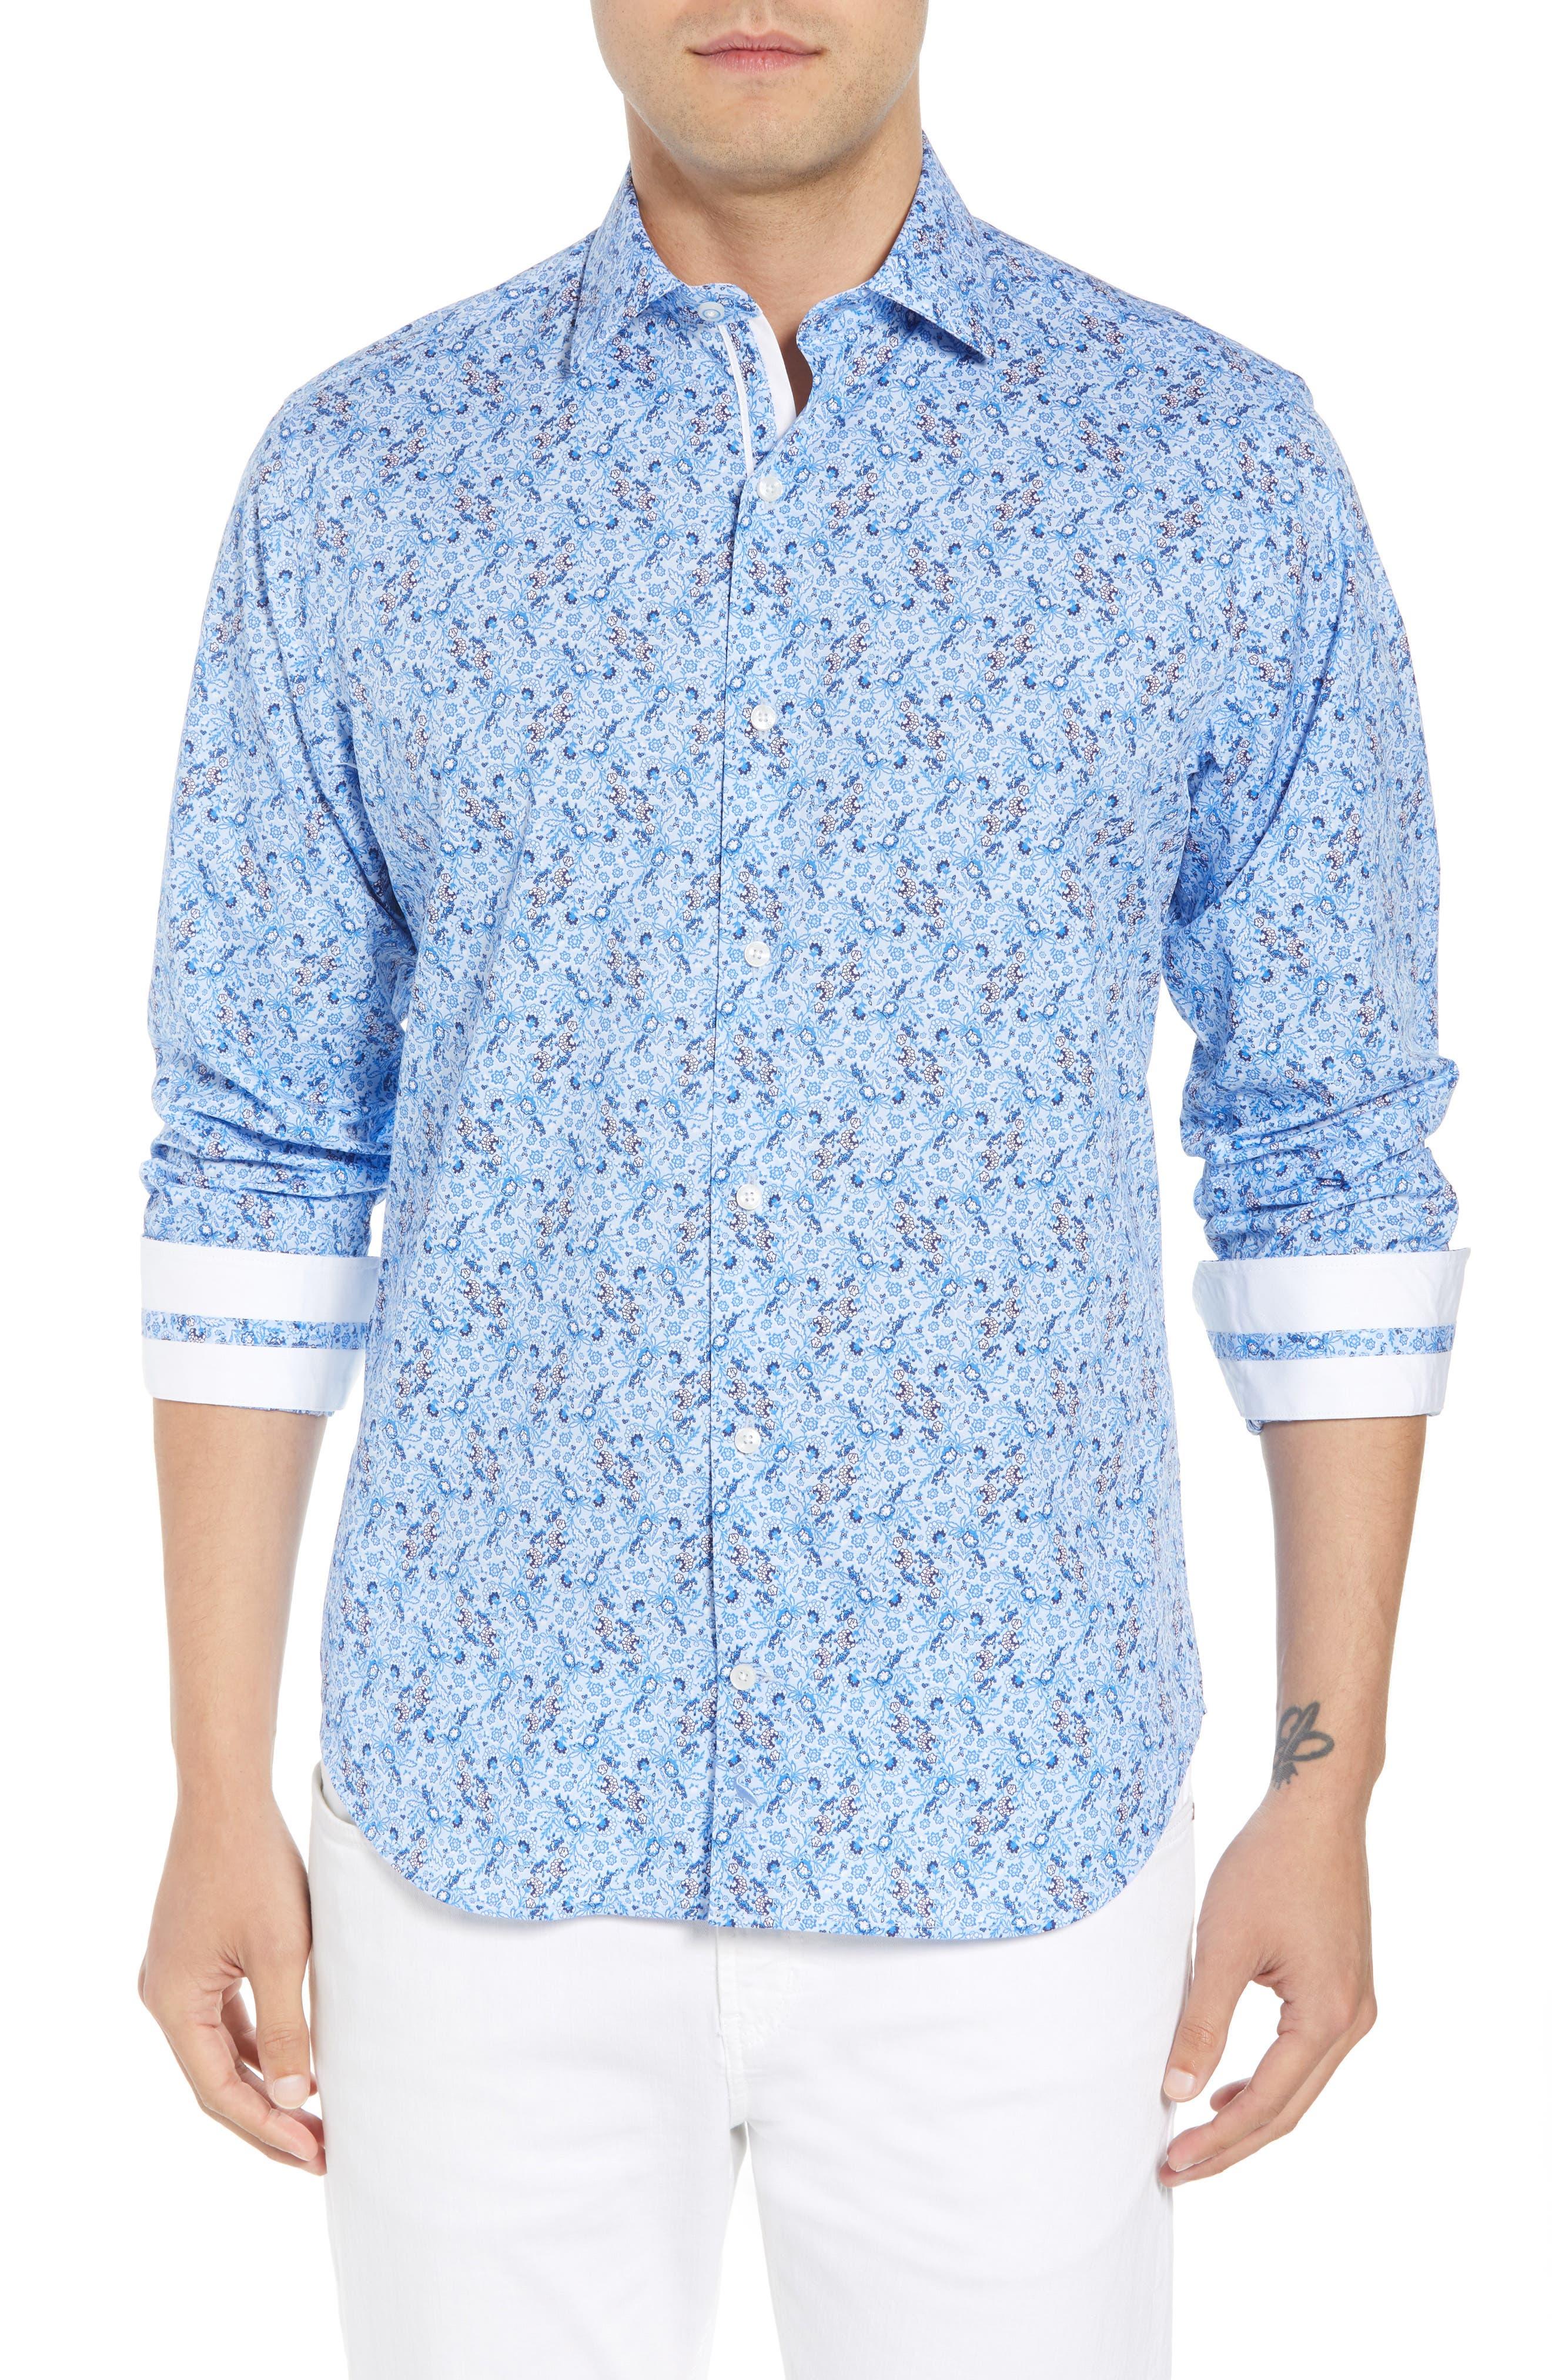 Stewart Regular Fit Floral Sport Shirt,                             Main thumbnail 1, color,                             Blue